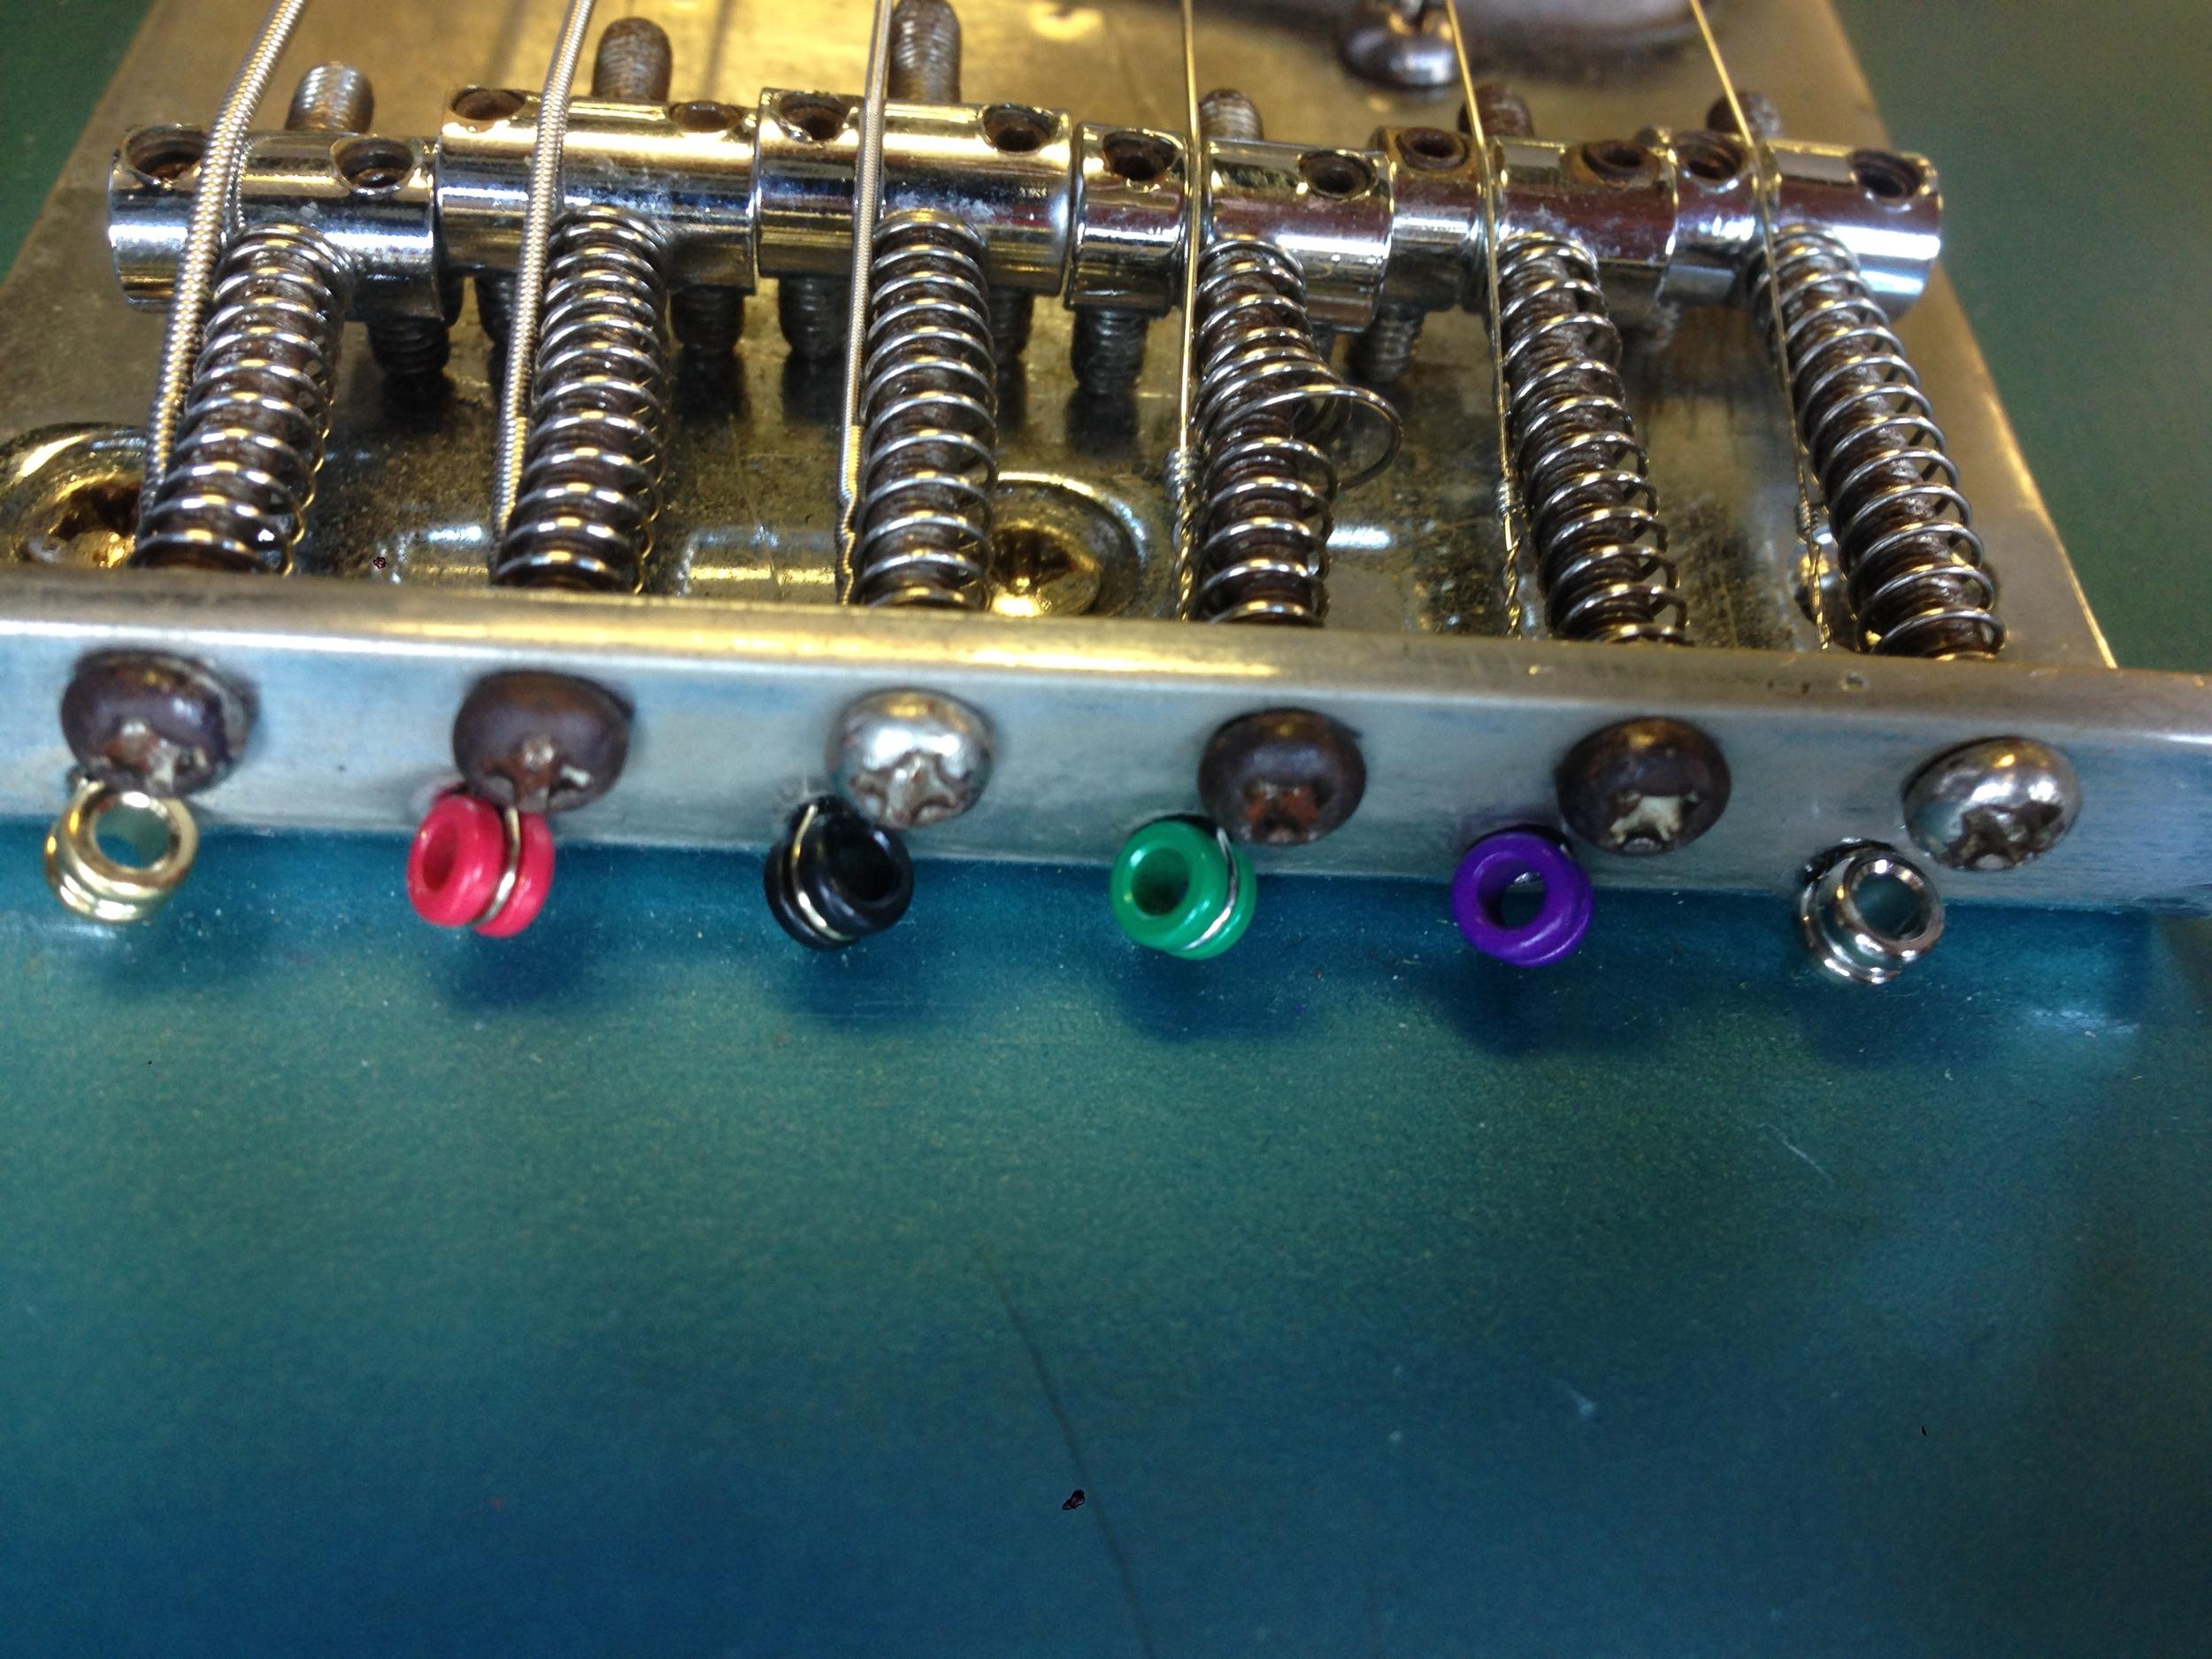 Saddles and adjustment screws